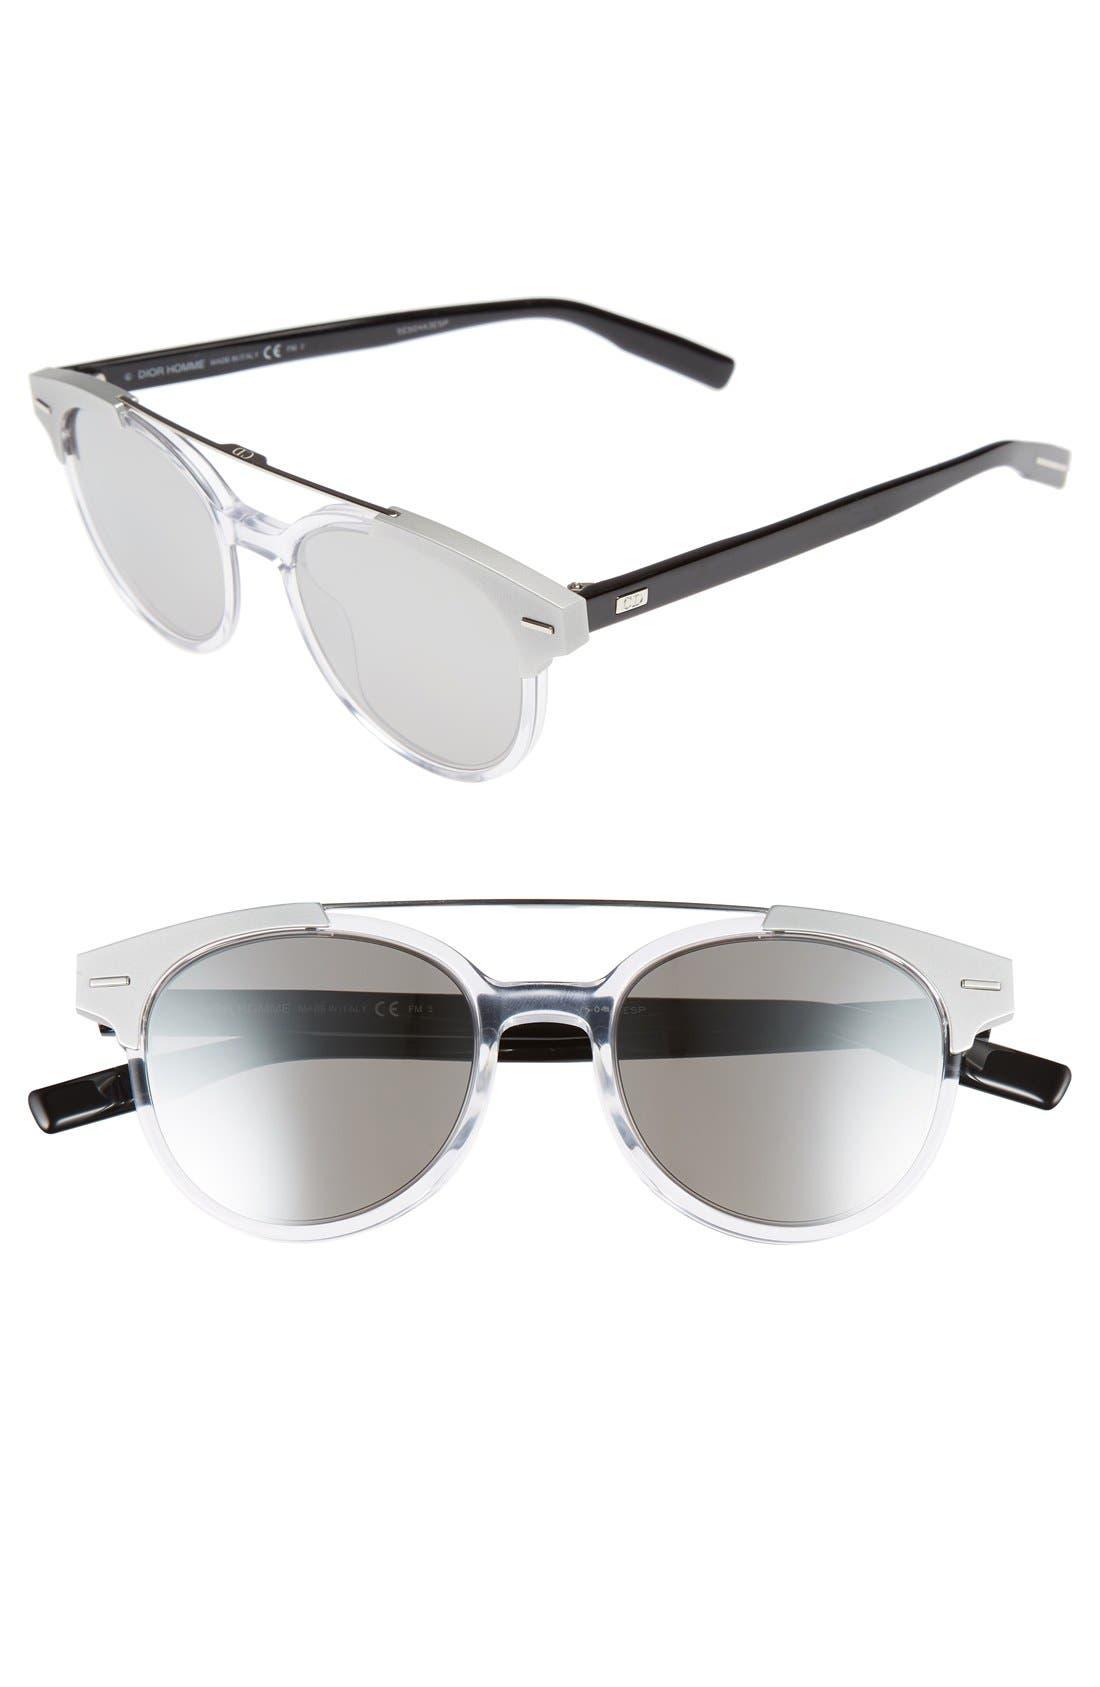 Dior 'Black Tie' 51mm Sunglasses,                             Main thumbnail 1, color,                             Crystal Black